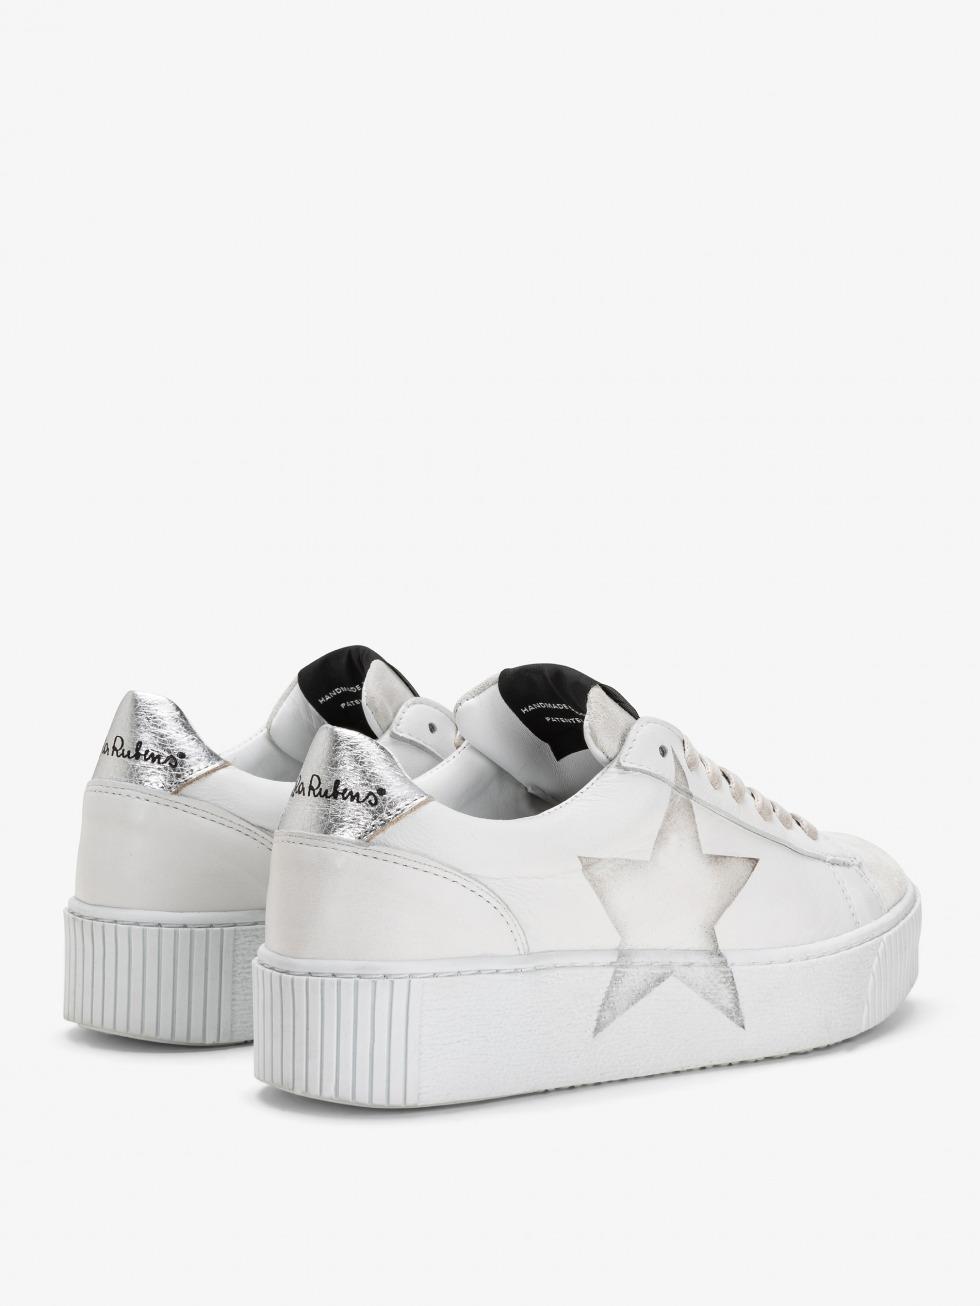 Cosmopolitan Sneakers - Moon Light Star